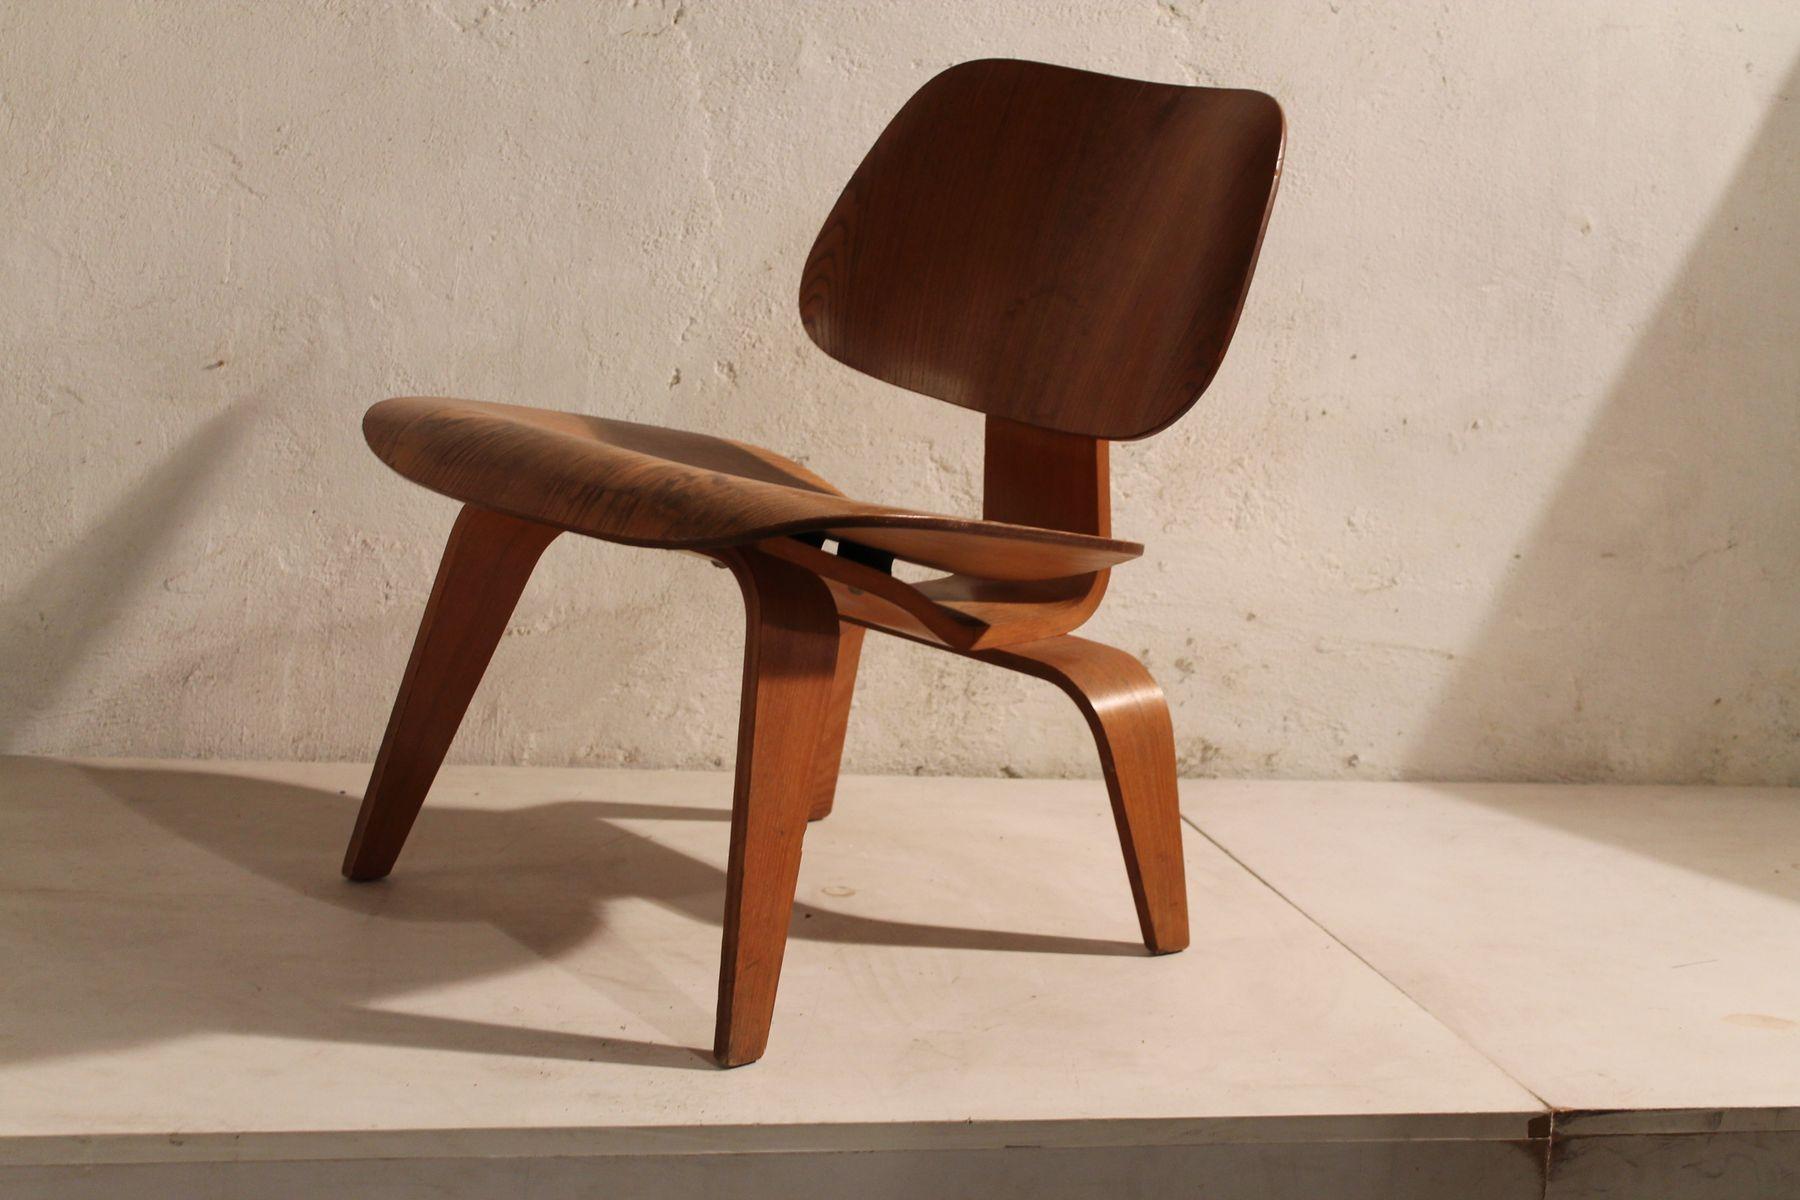 lcw stuhl von charles ray eames f r herman miller. Black Bedroom Furniture Sets. Home Design Ideas